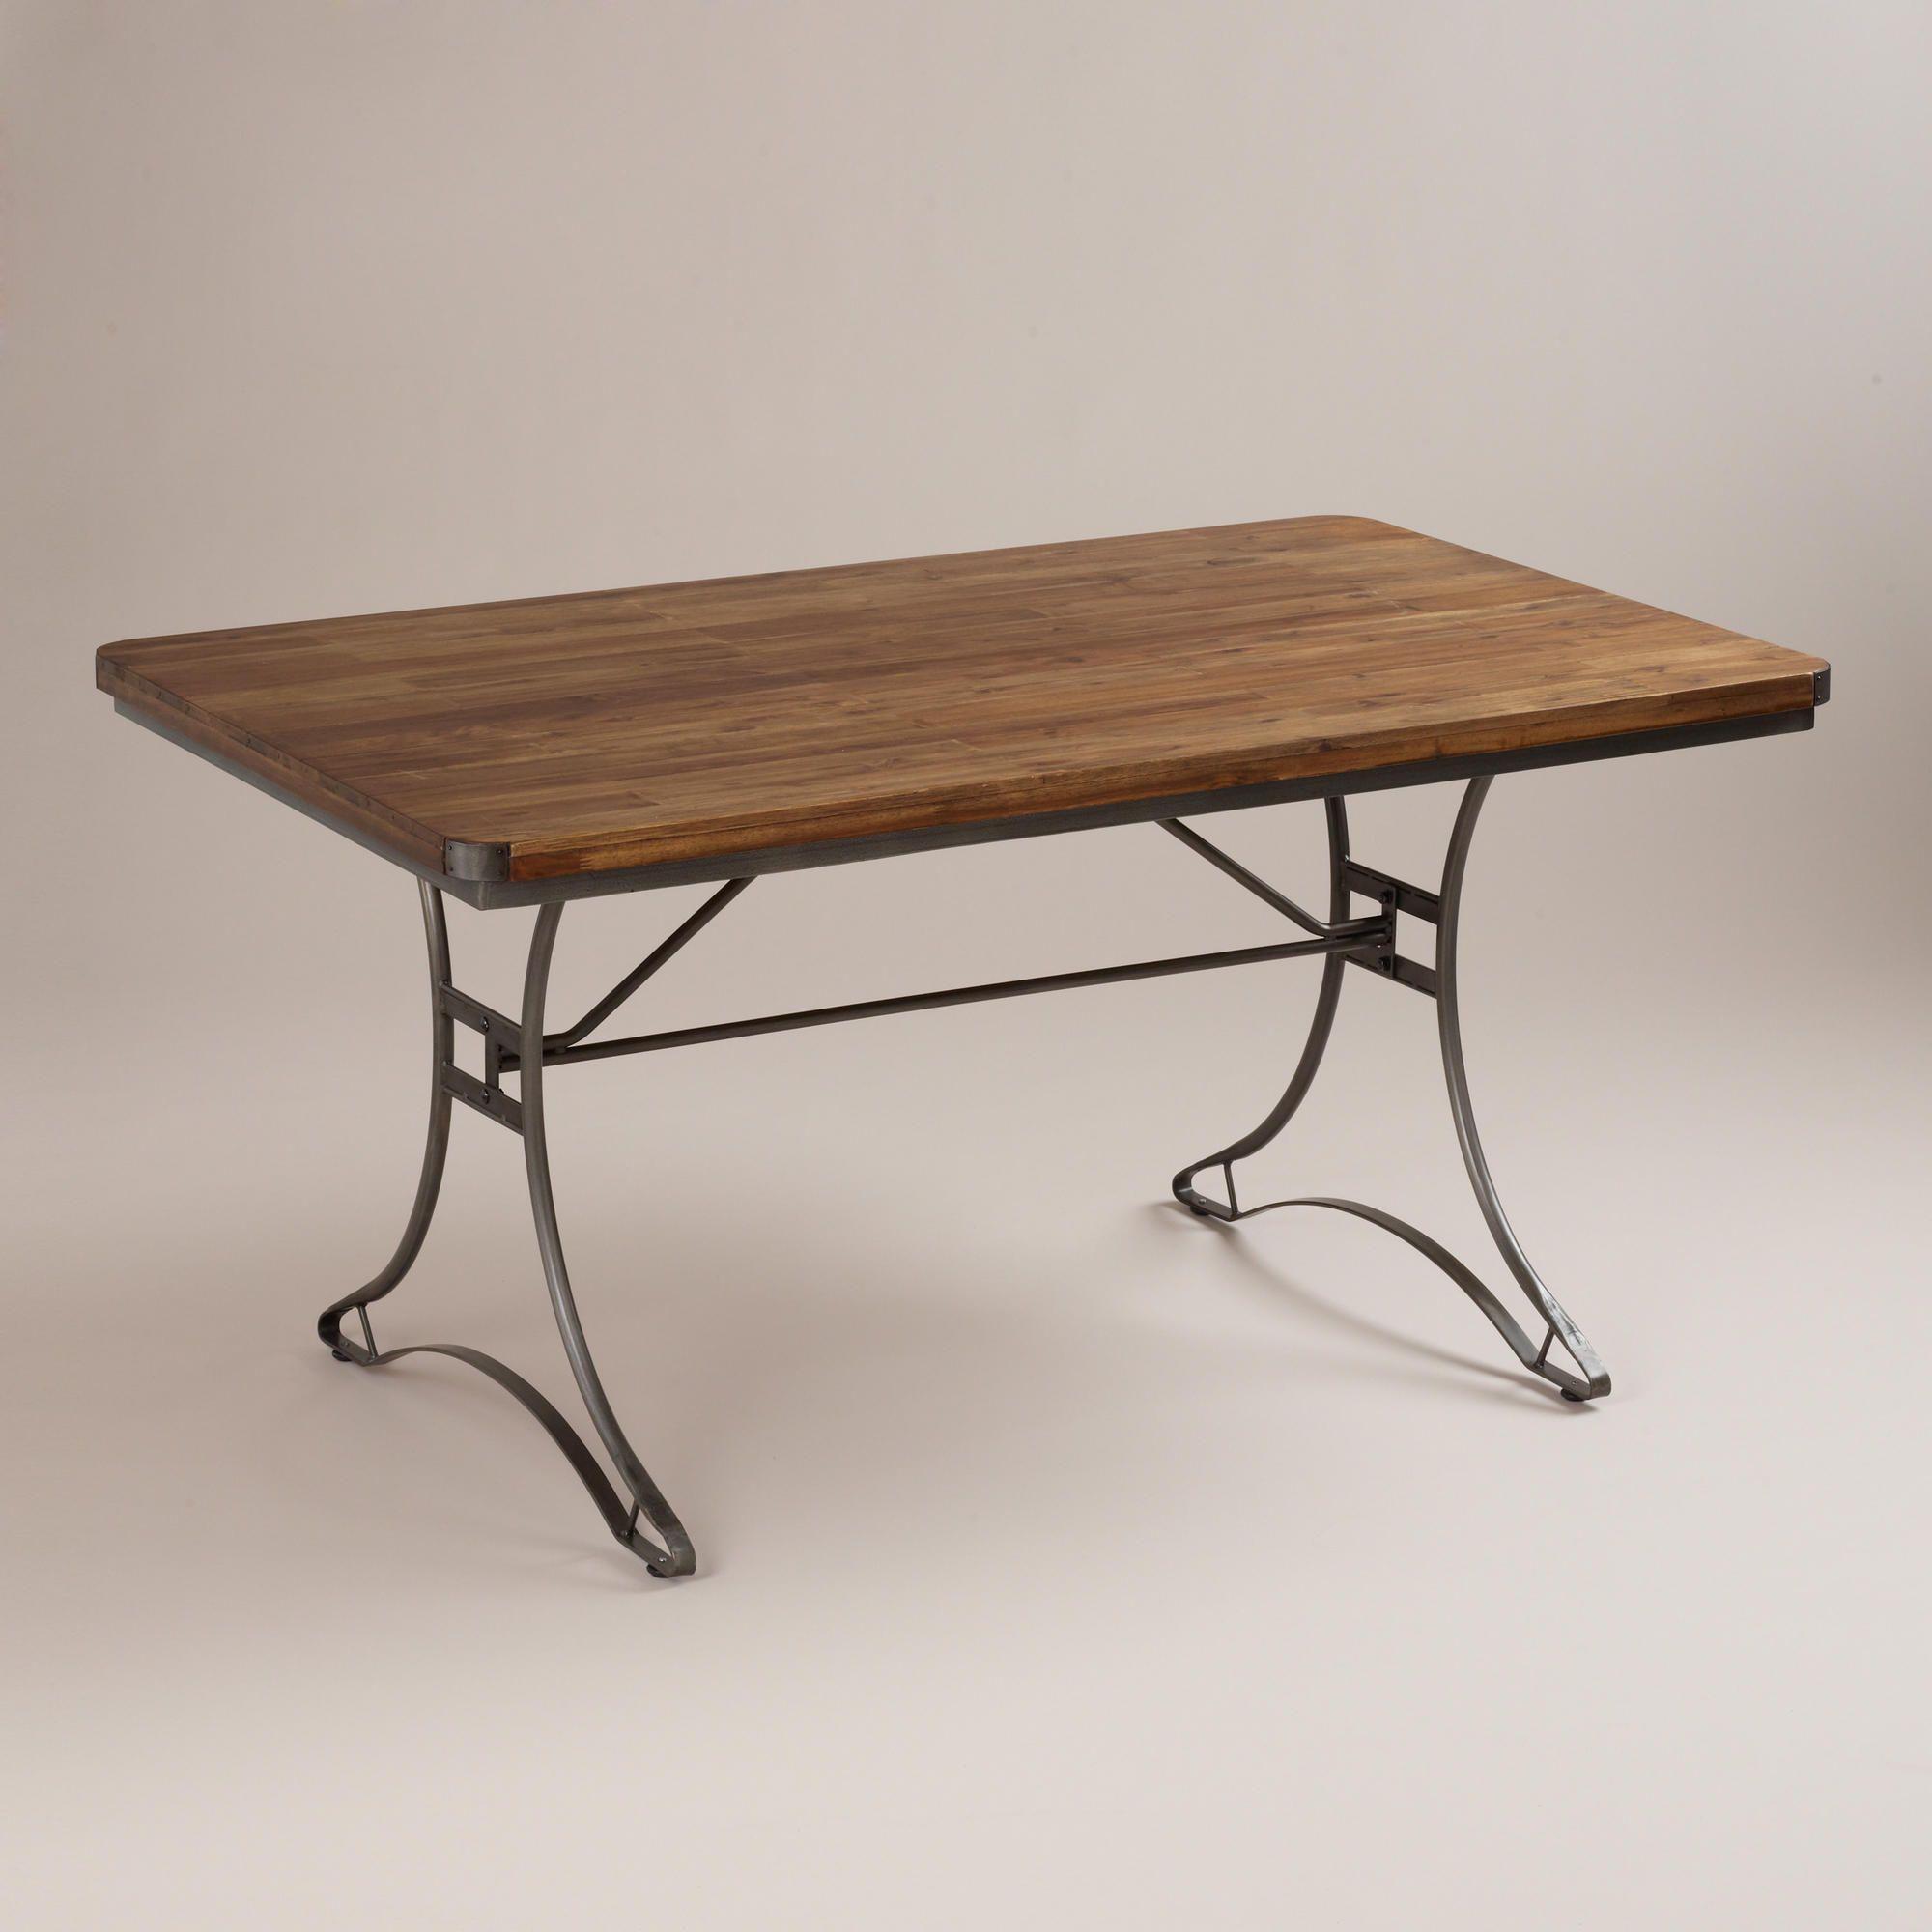 jackson rectangular table with metal base | metals, vintage